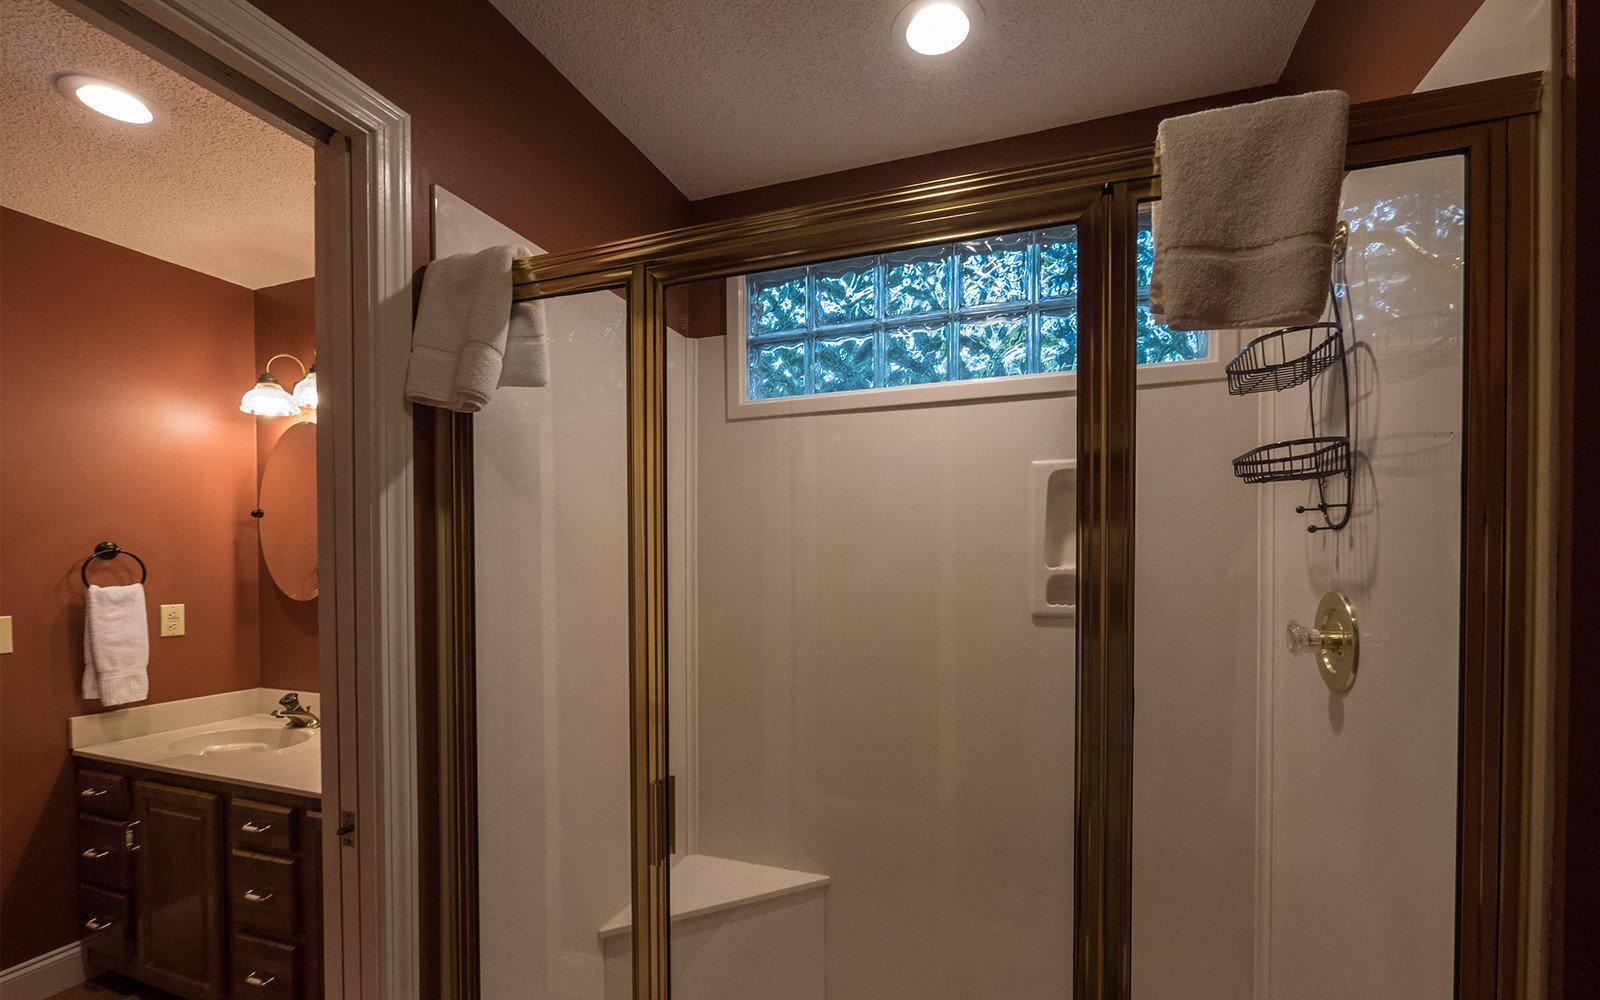 Hilt-St-house-master-bathroom